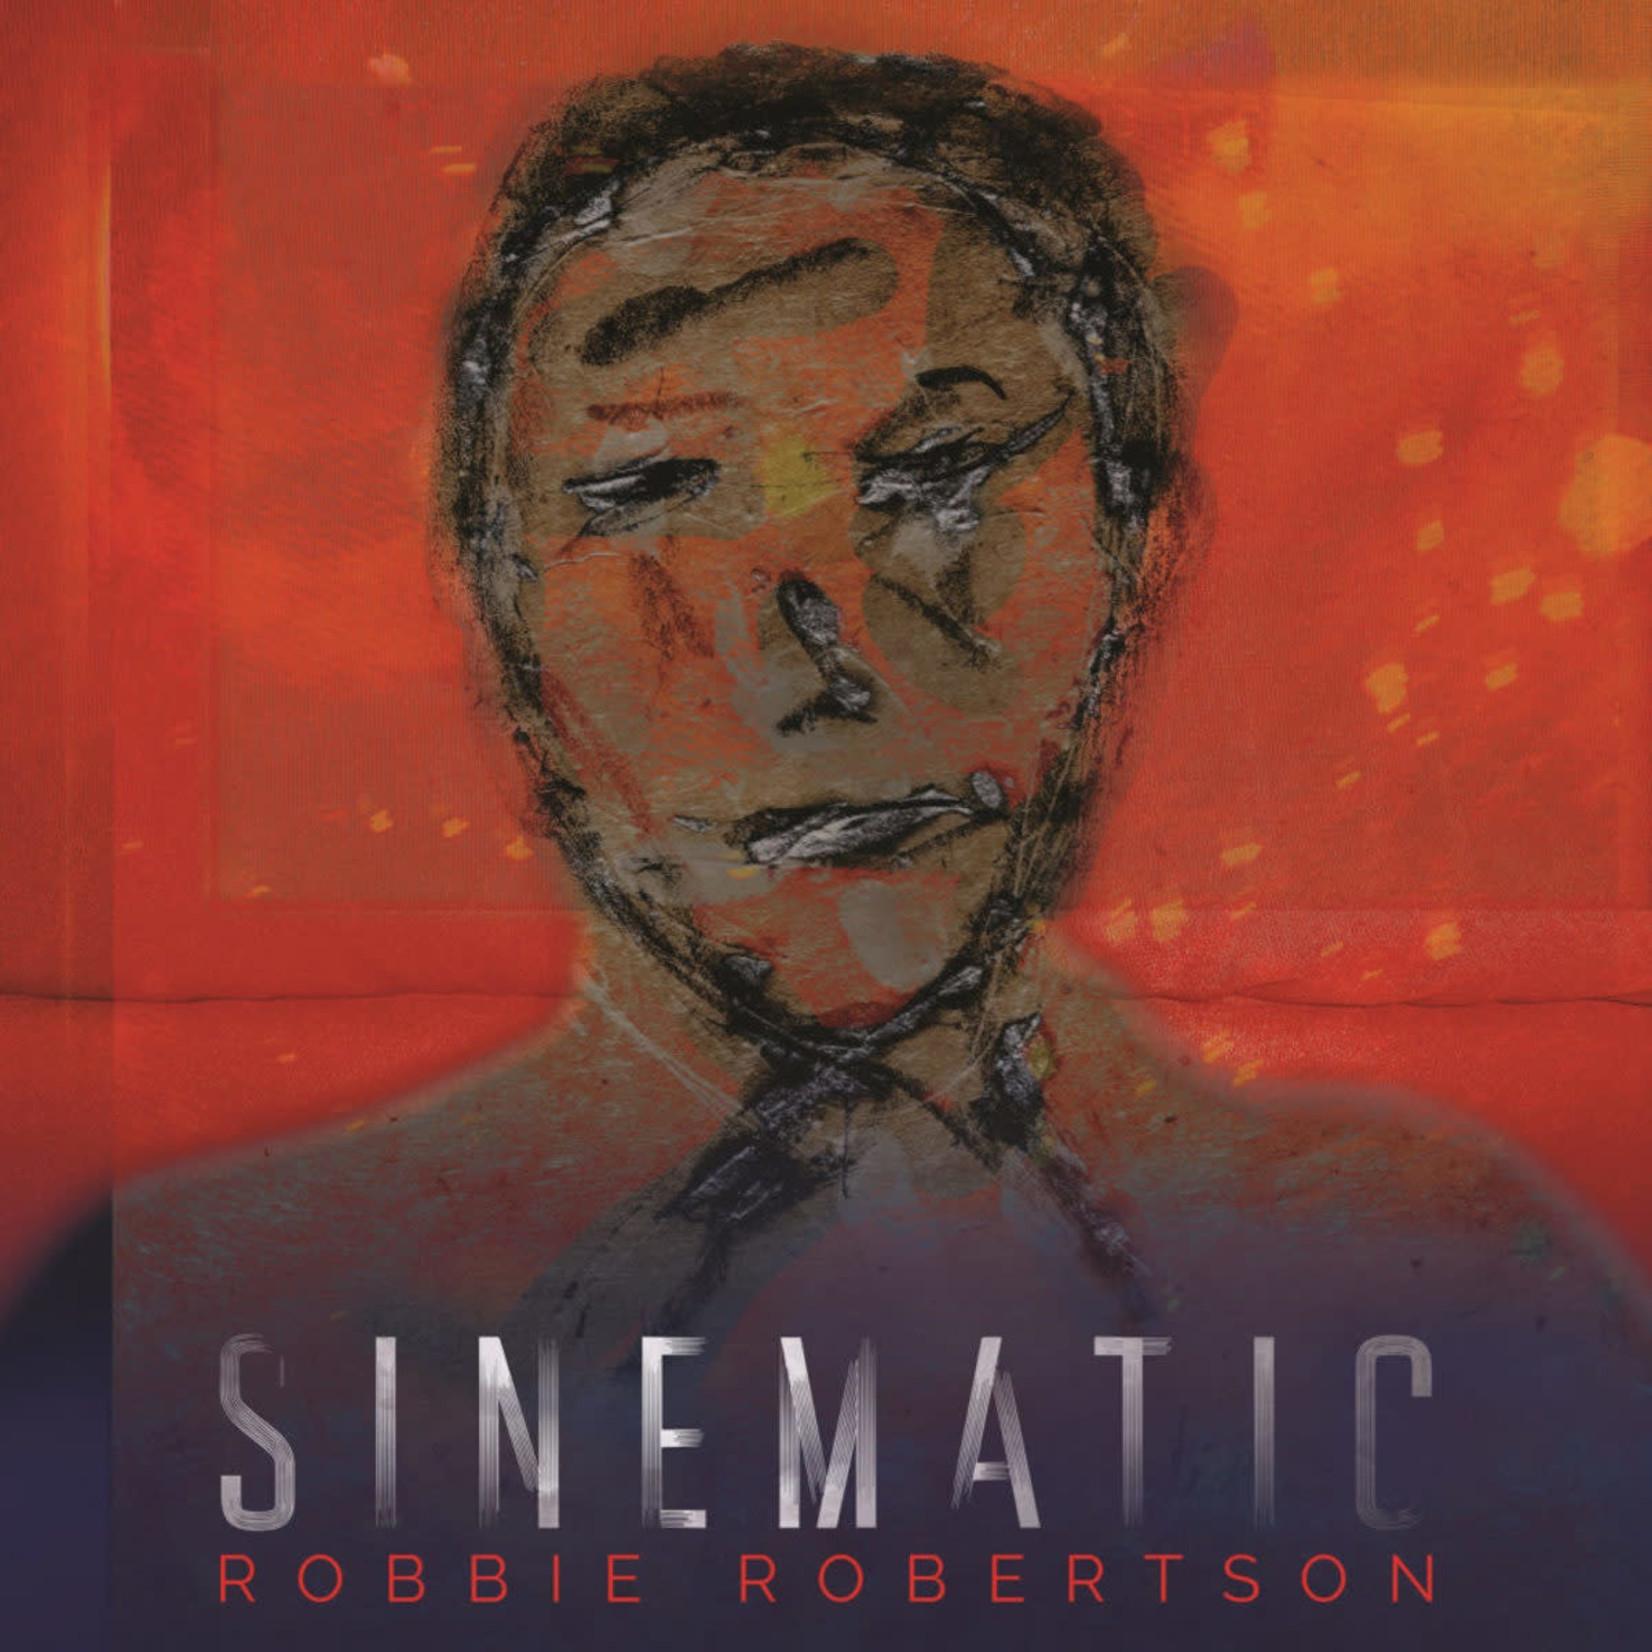 [New] Robertson, Robbie: Sinematic (2LP)